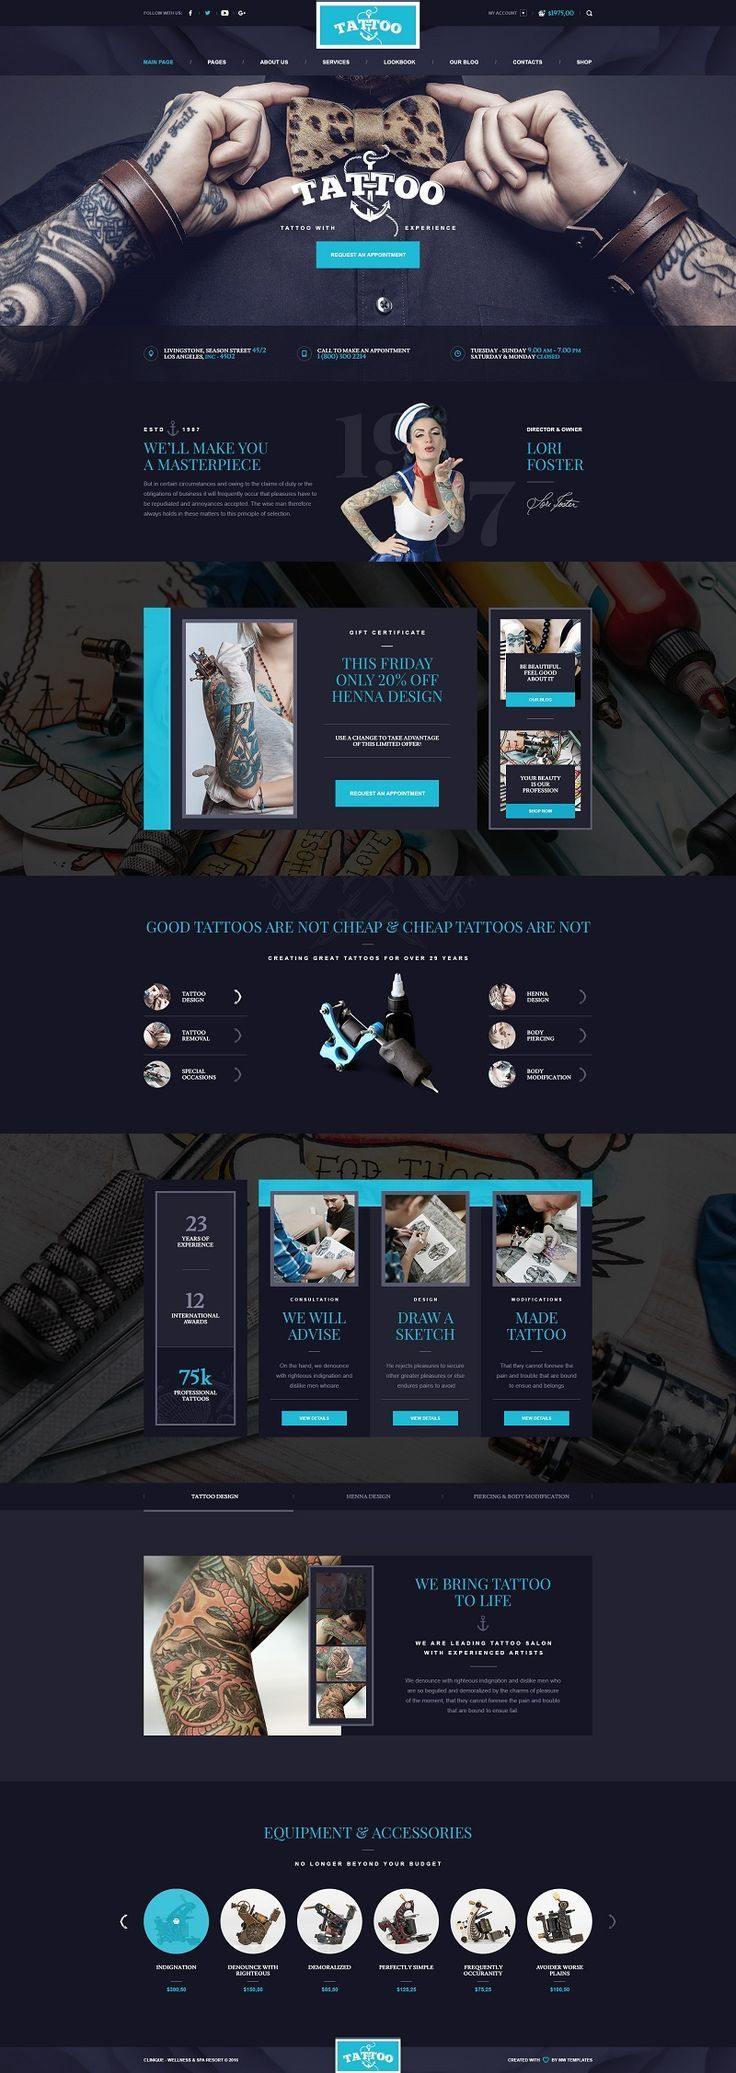 25 best ideas about Web design on Pinterest  Web ui design Ui design and Website layout